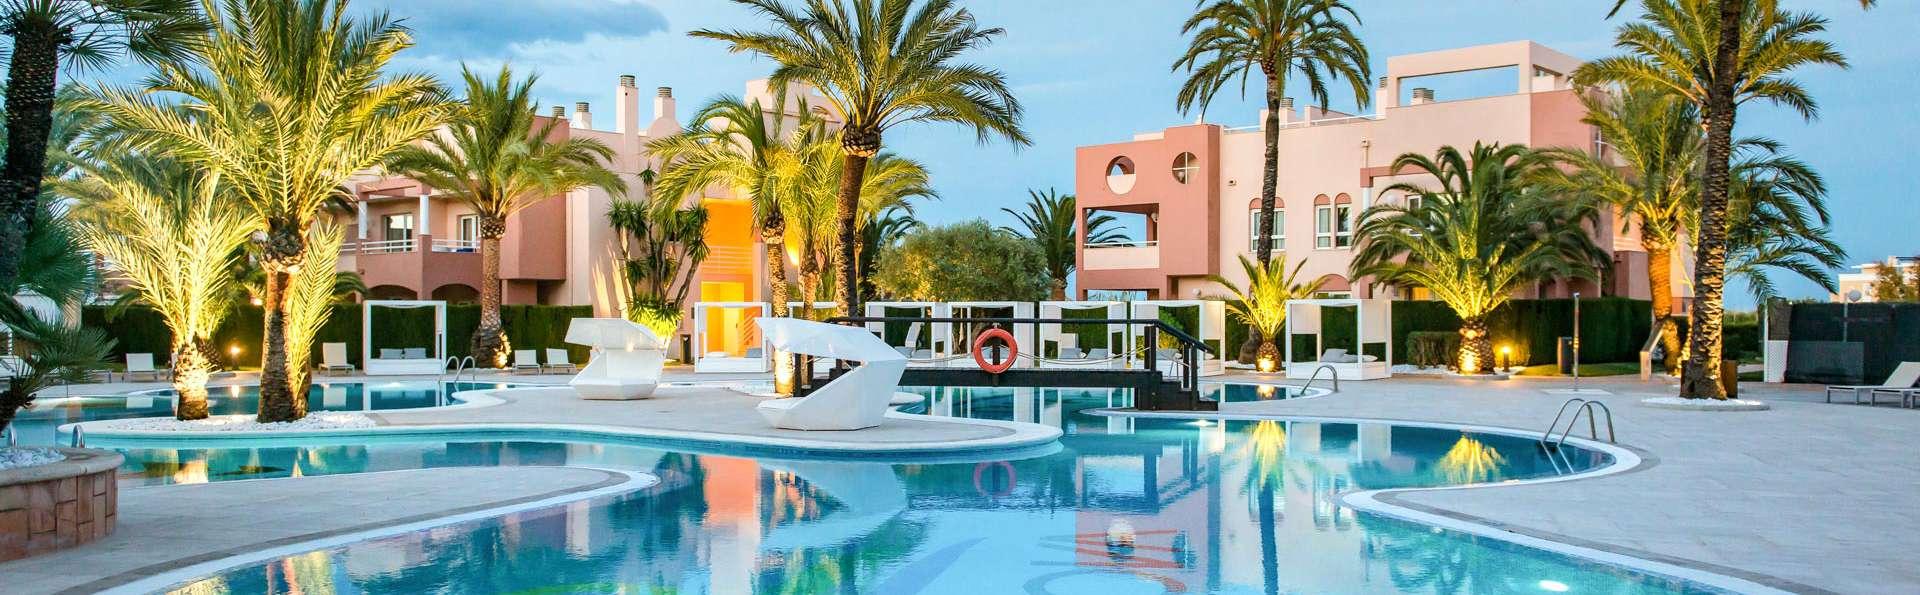 Oliva Nova Golf Beach & Golf Hotel - EDIT_POOL_04.jpg